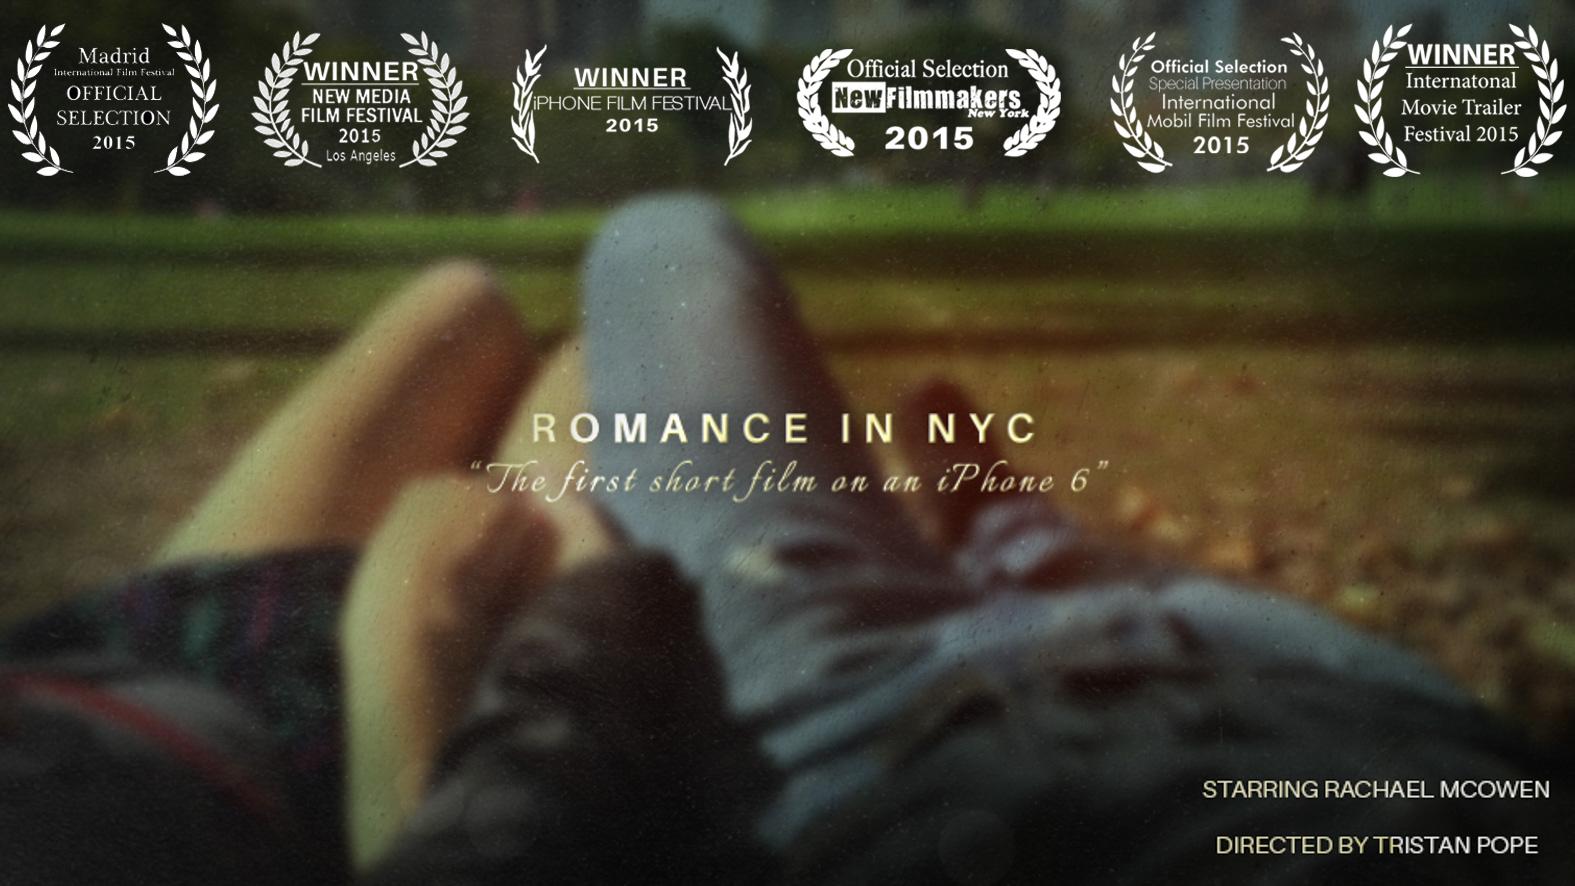 RomanceInNYC_Laurels6